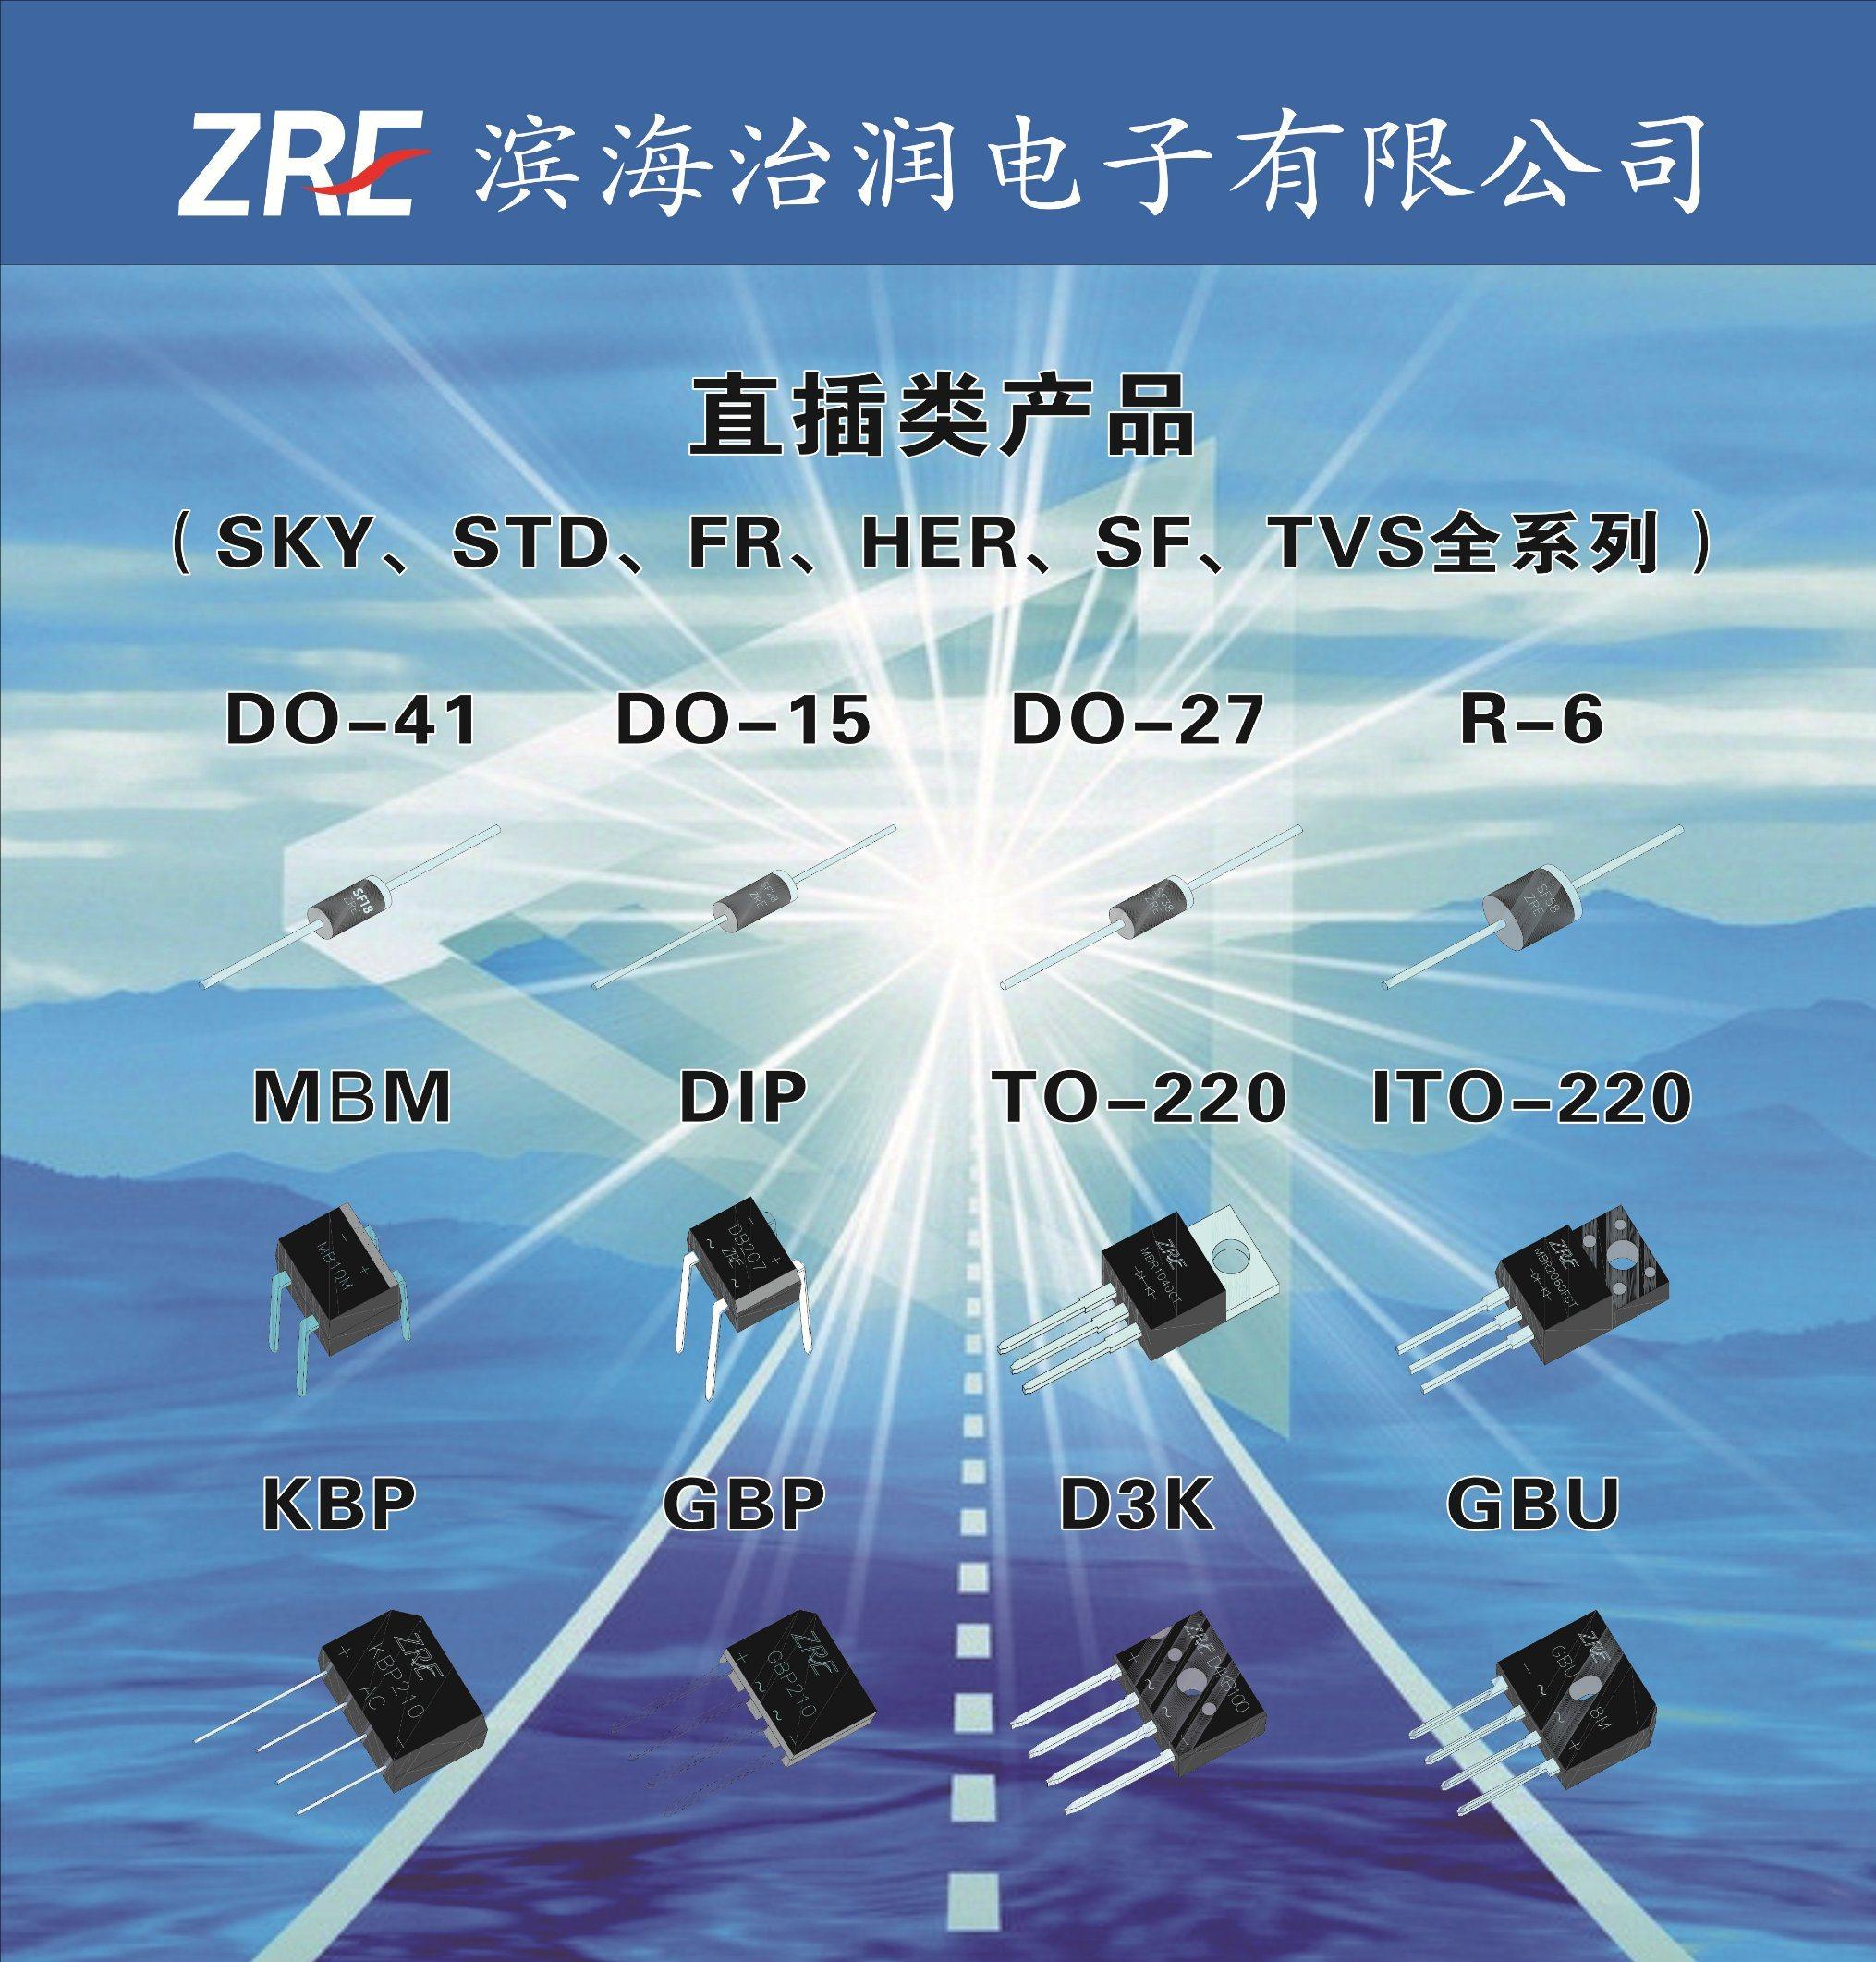 10A Gbu Axial Standard Bridge Diode Gbu10m Gbu10g Gbu Package